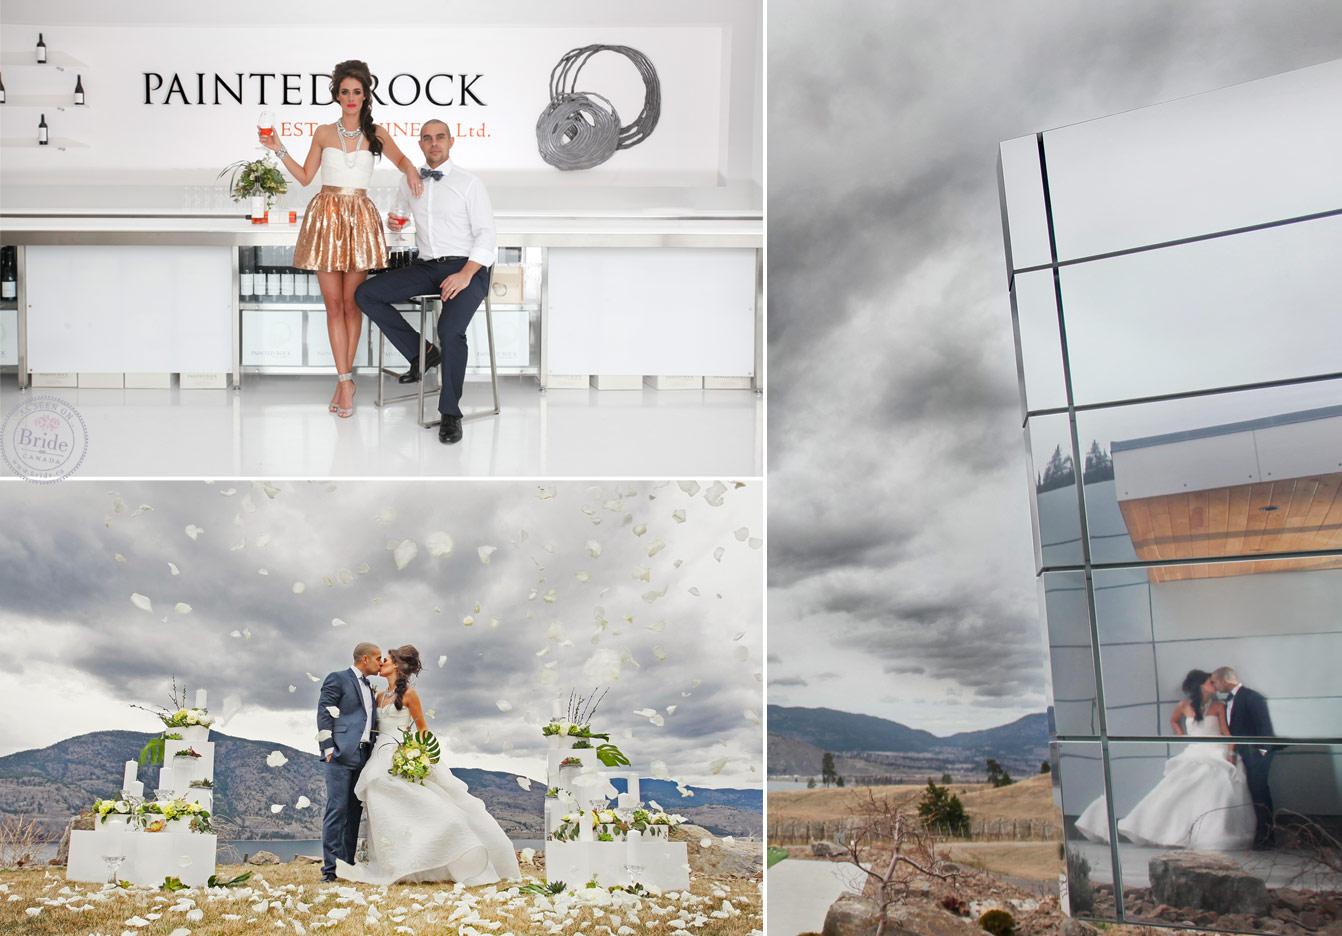 Bride Ca Painted Rock Winery A Modern Okanagan Wedding